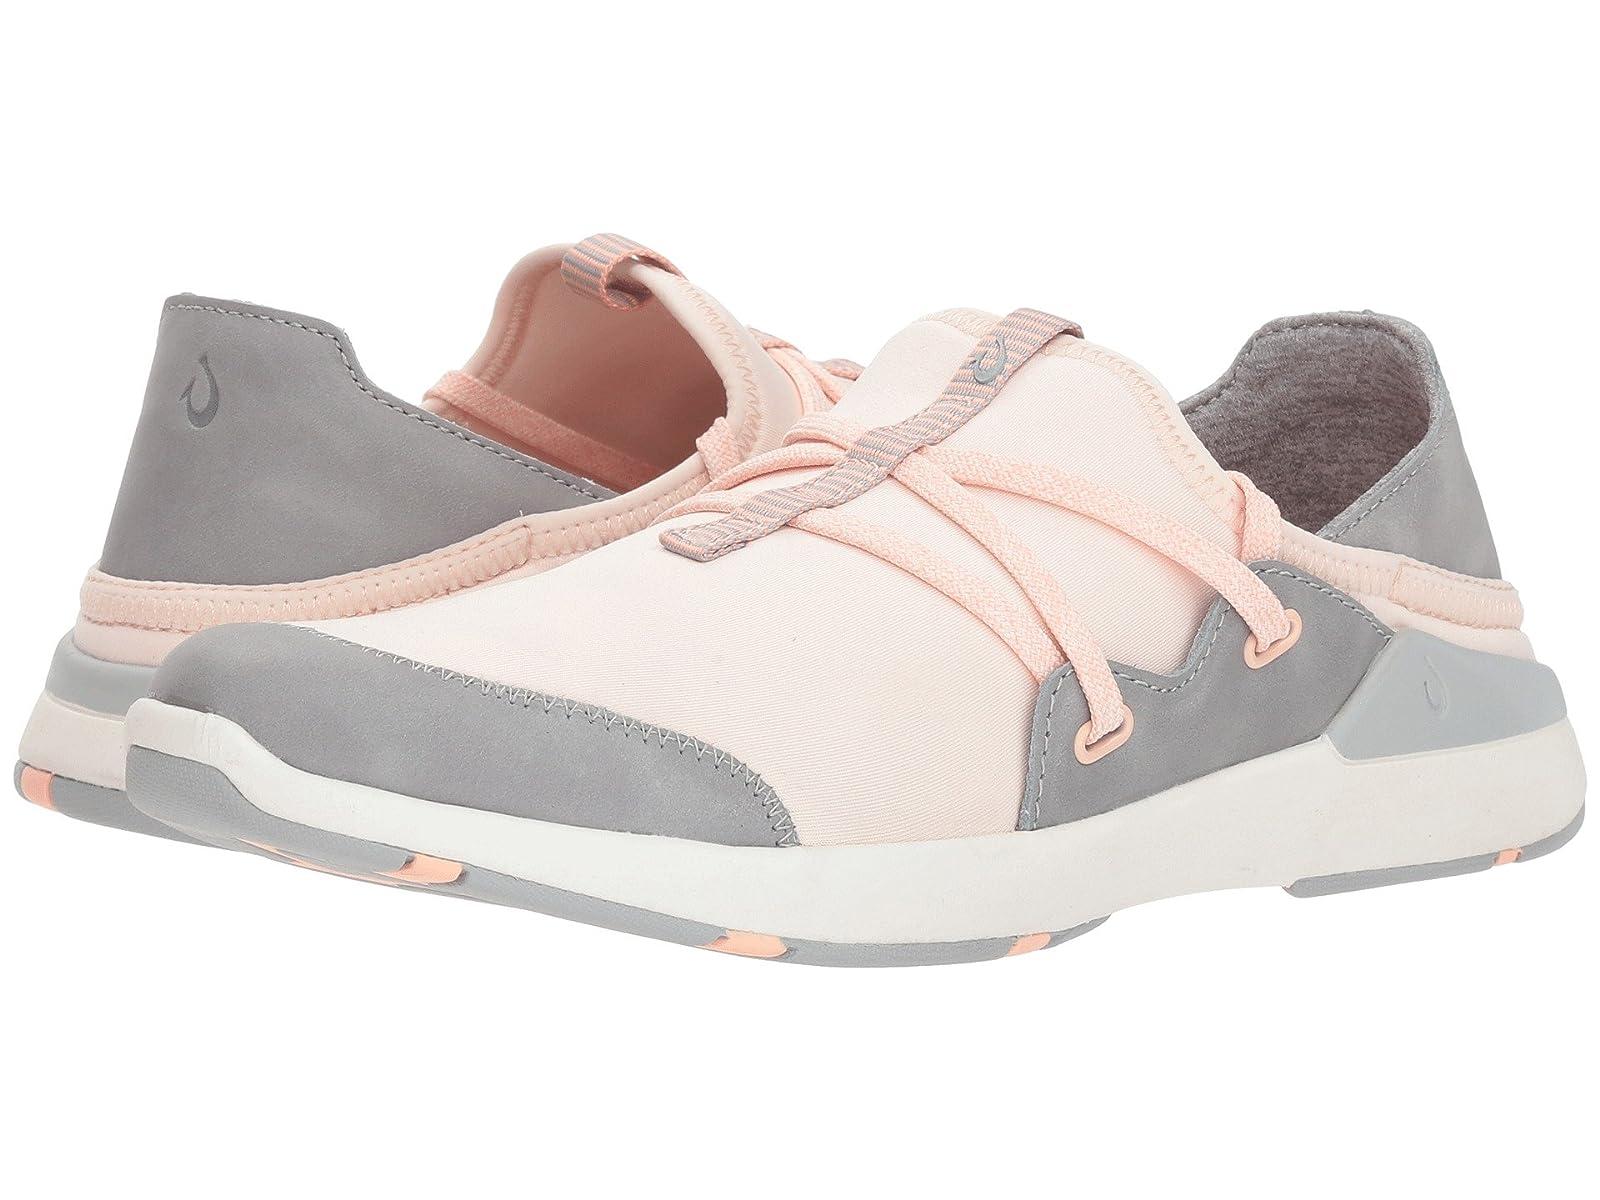 OluKai Miki LiAtmospheric grades have affordable shoes